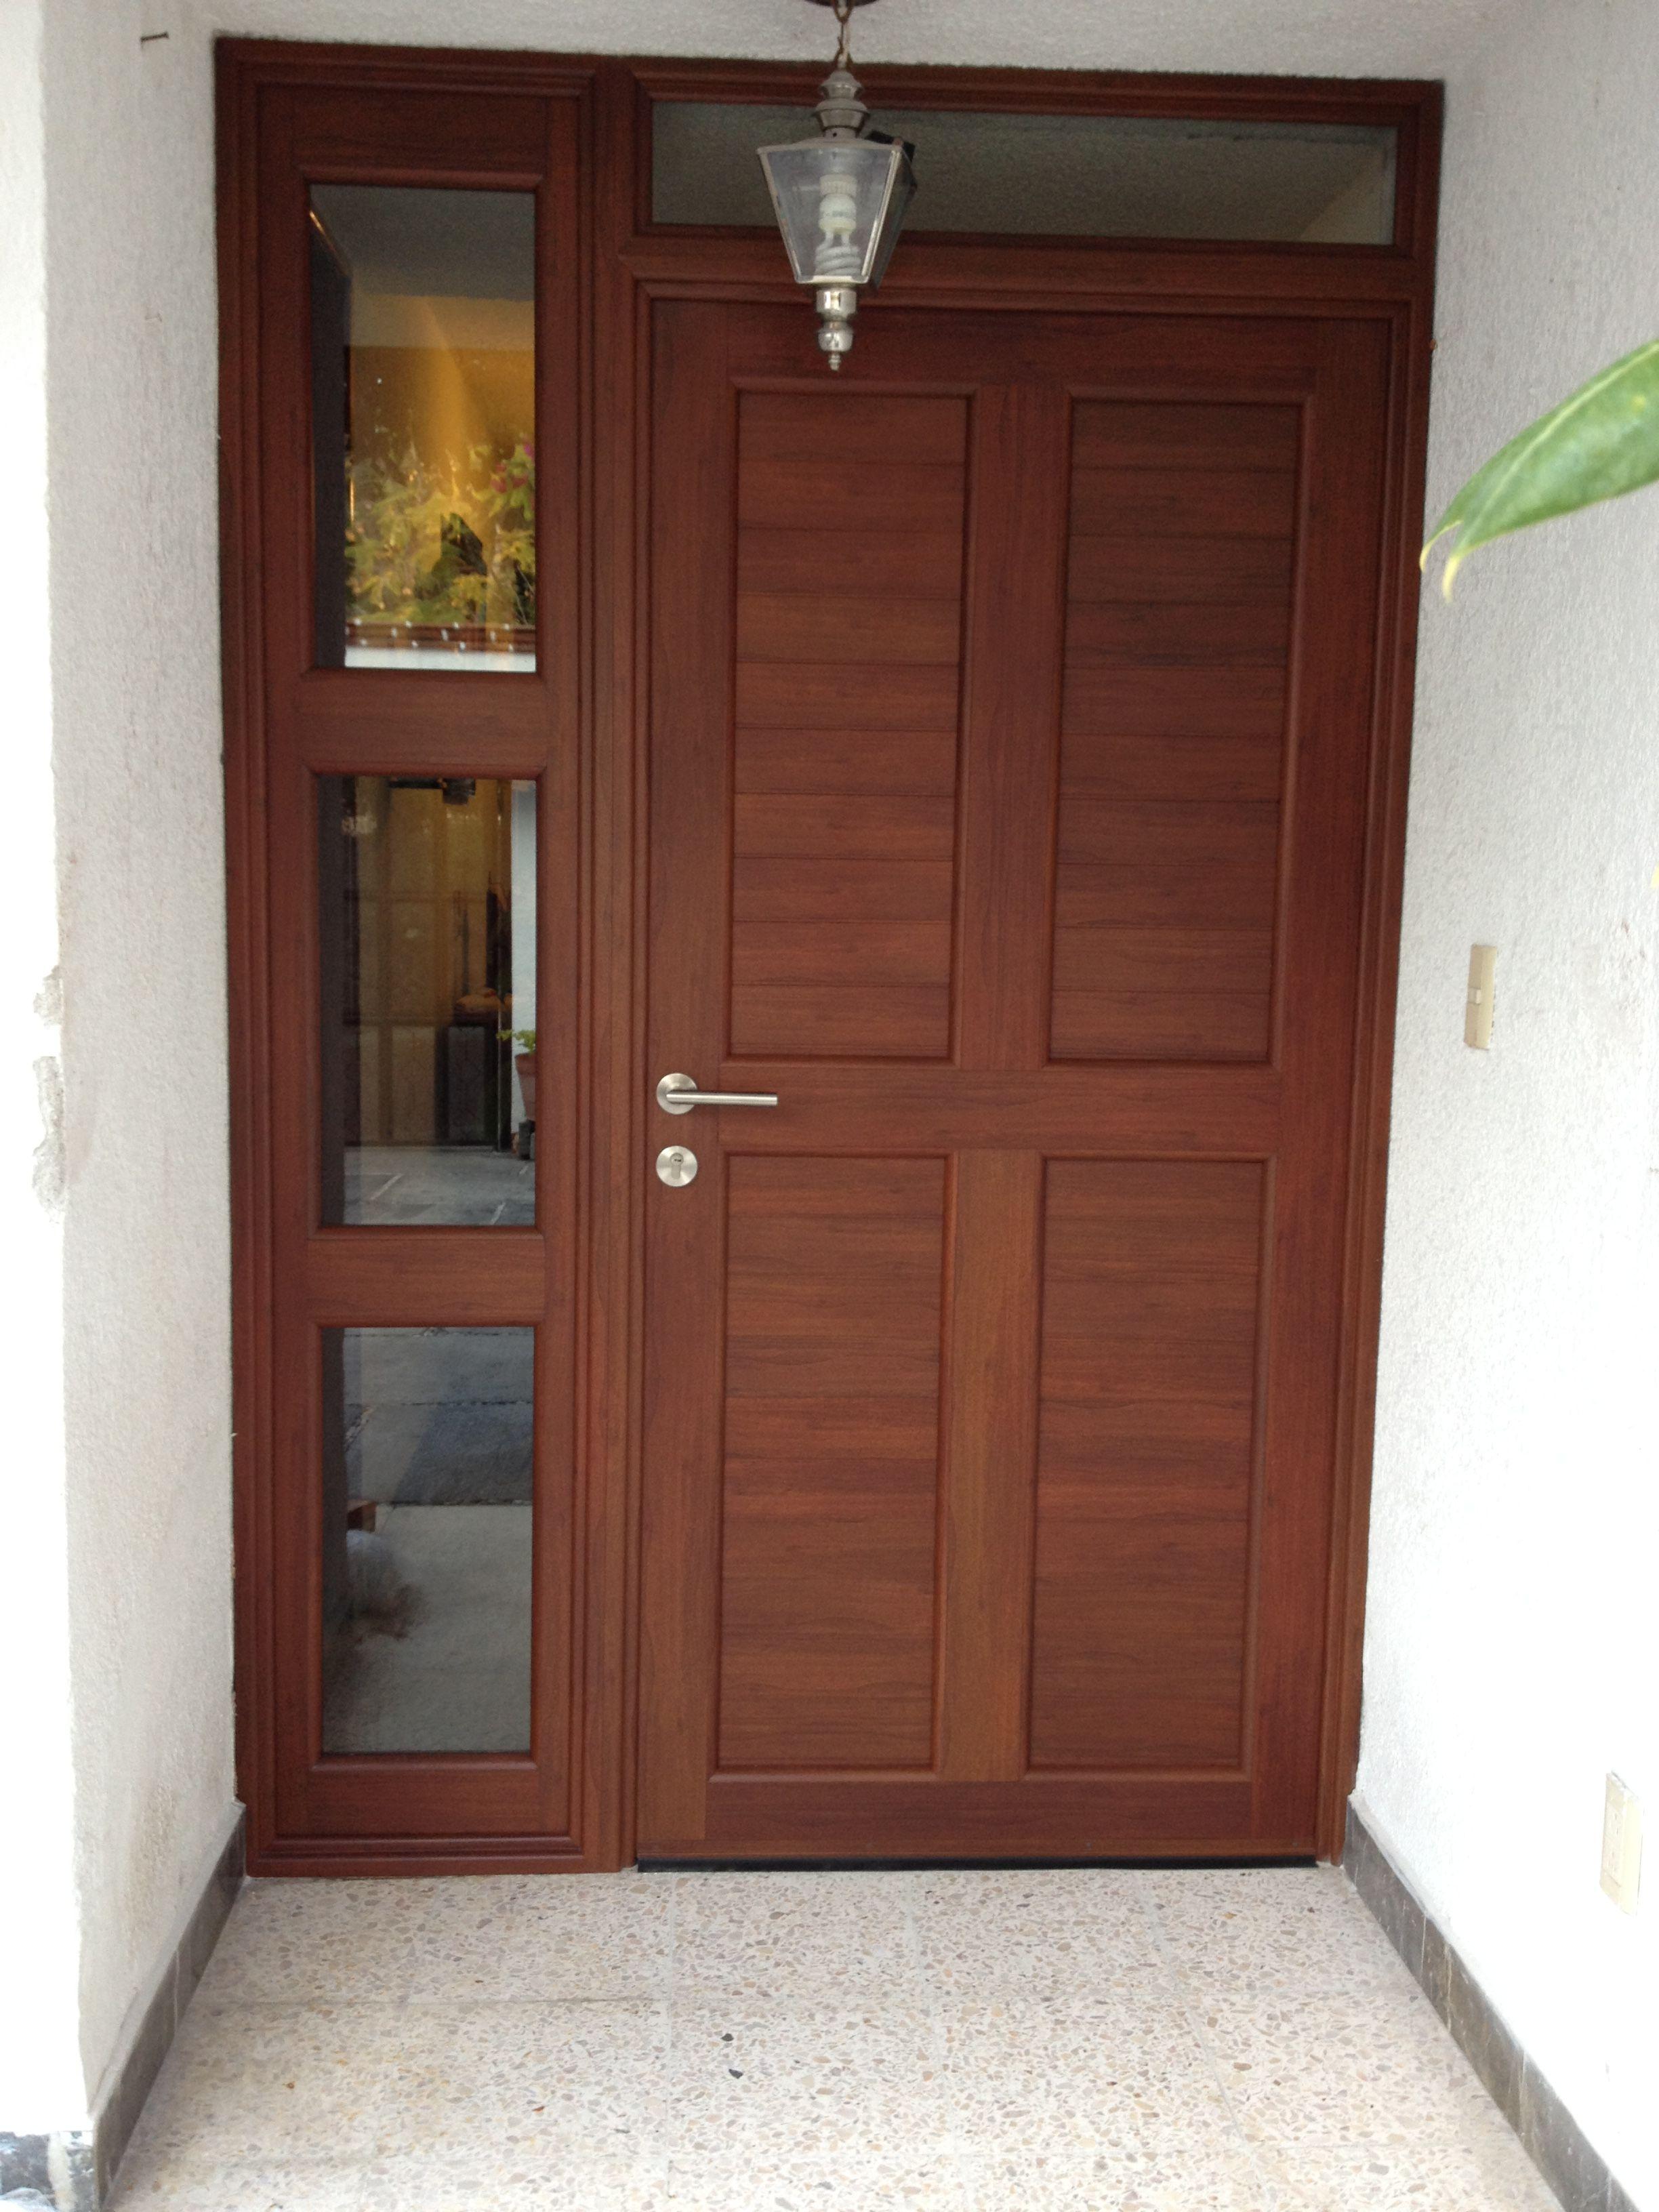 Puertas de entrada principal ideas de disenos for Puertas para casa entrada principal